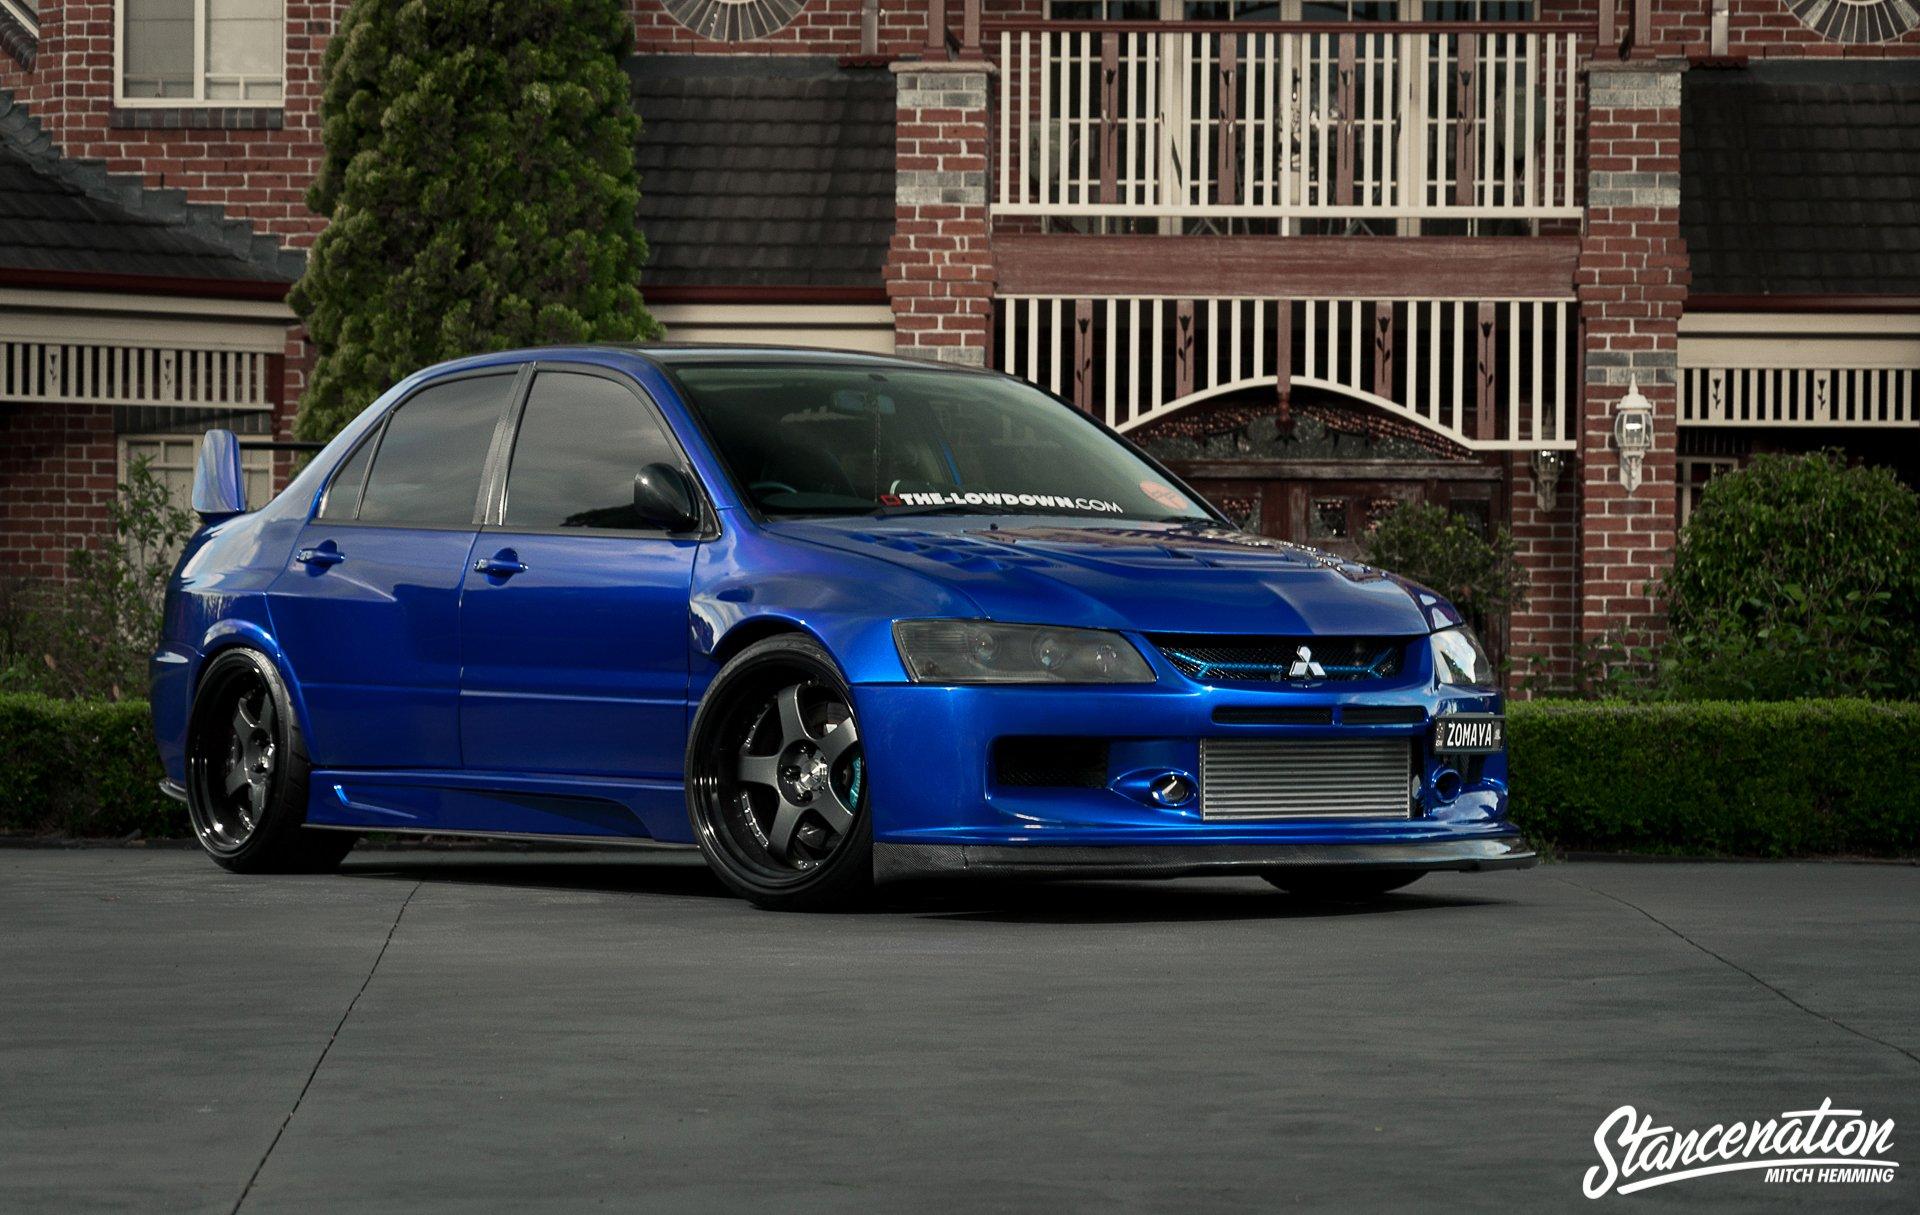 mitsubishi lancer evo ix blue cars sedan modified wallpaper 1920x1215 812915 wallpaperup - Mitsubishi Evo 9 Blue